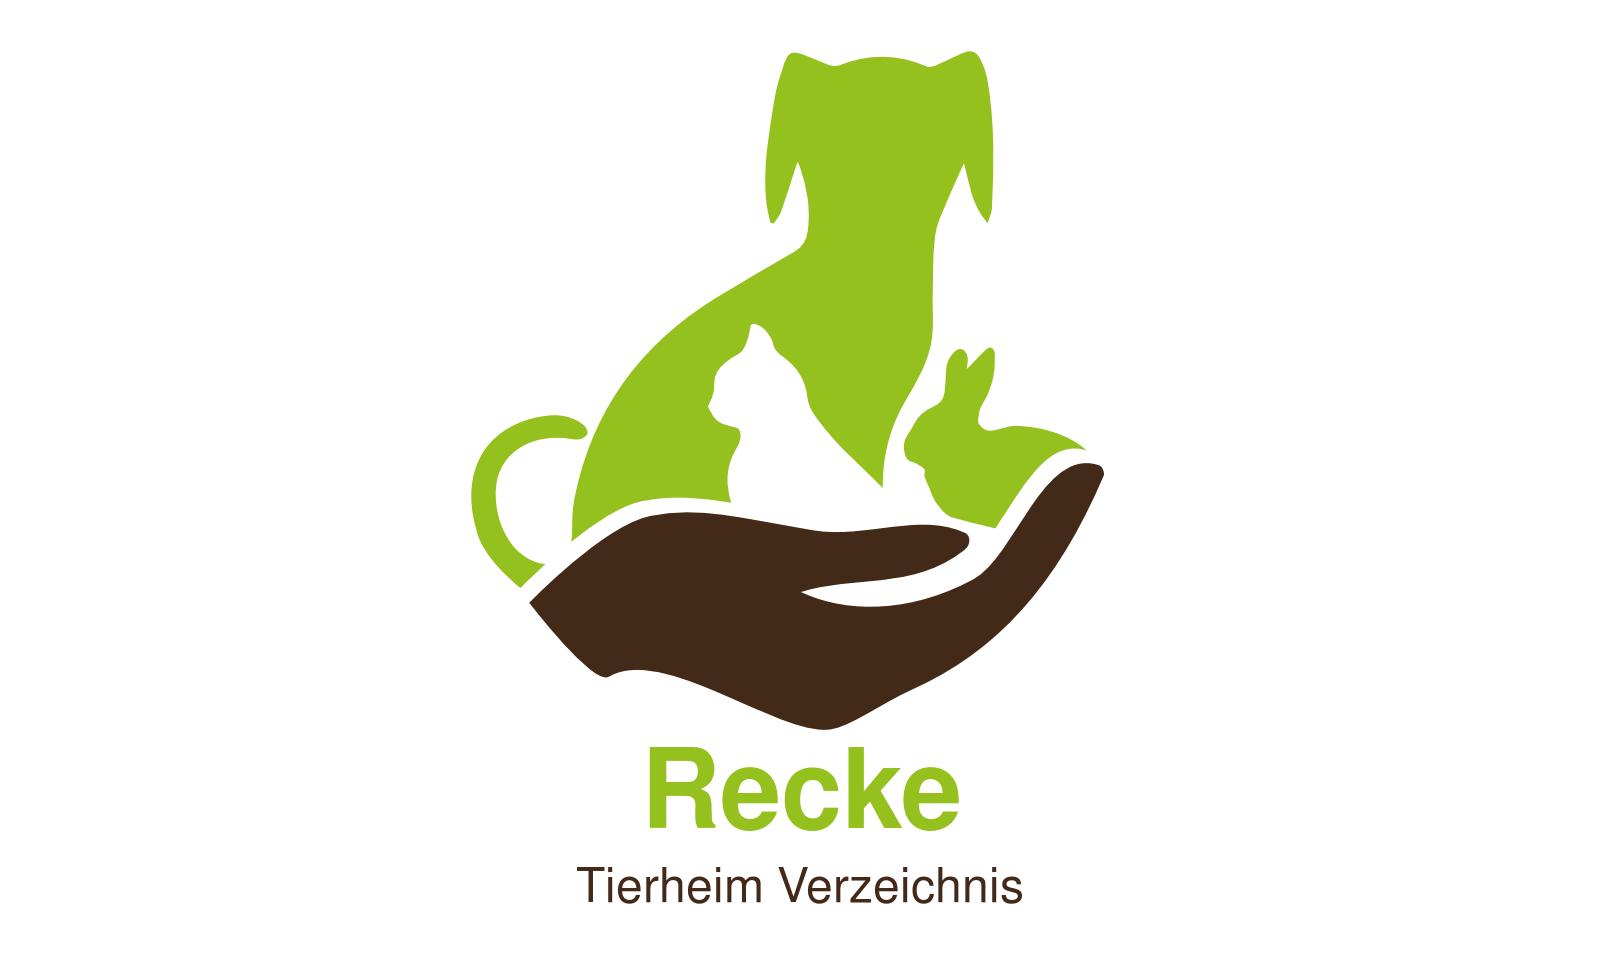 Tierheim Recke